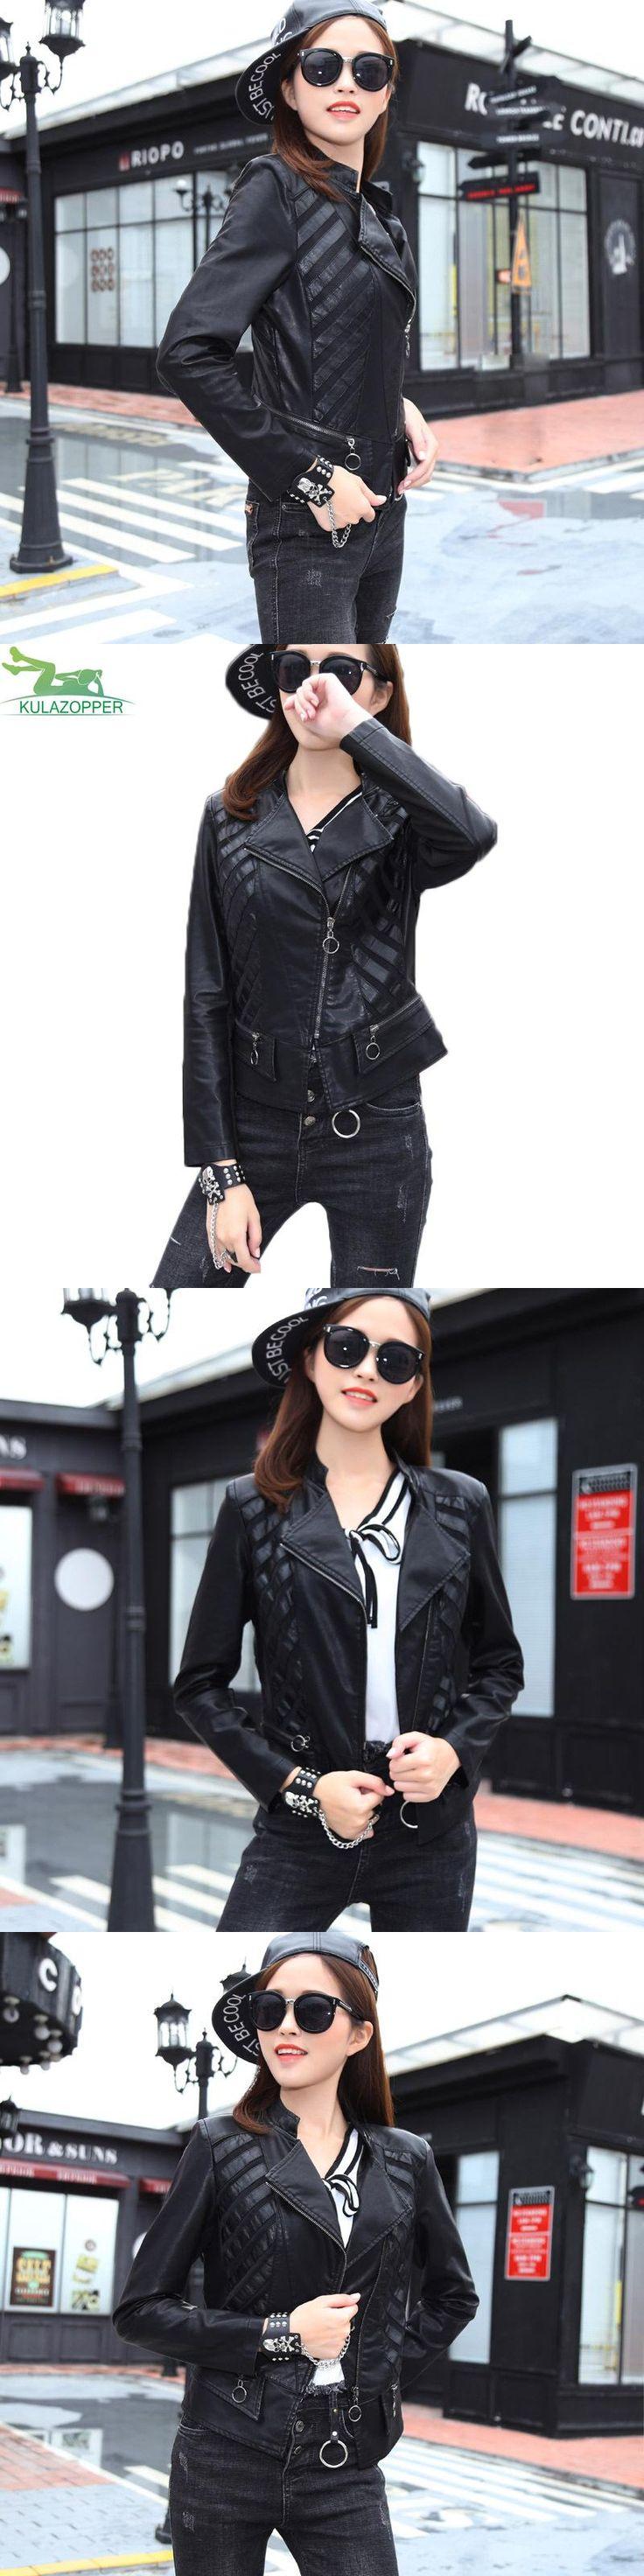 women leather jacket 2017 autumn new black PU leather coat casual short style spliced Leather stripes female leather coat QW423